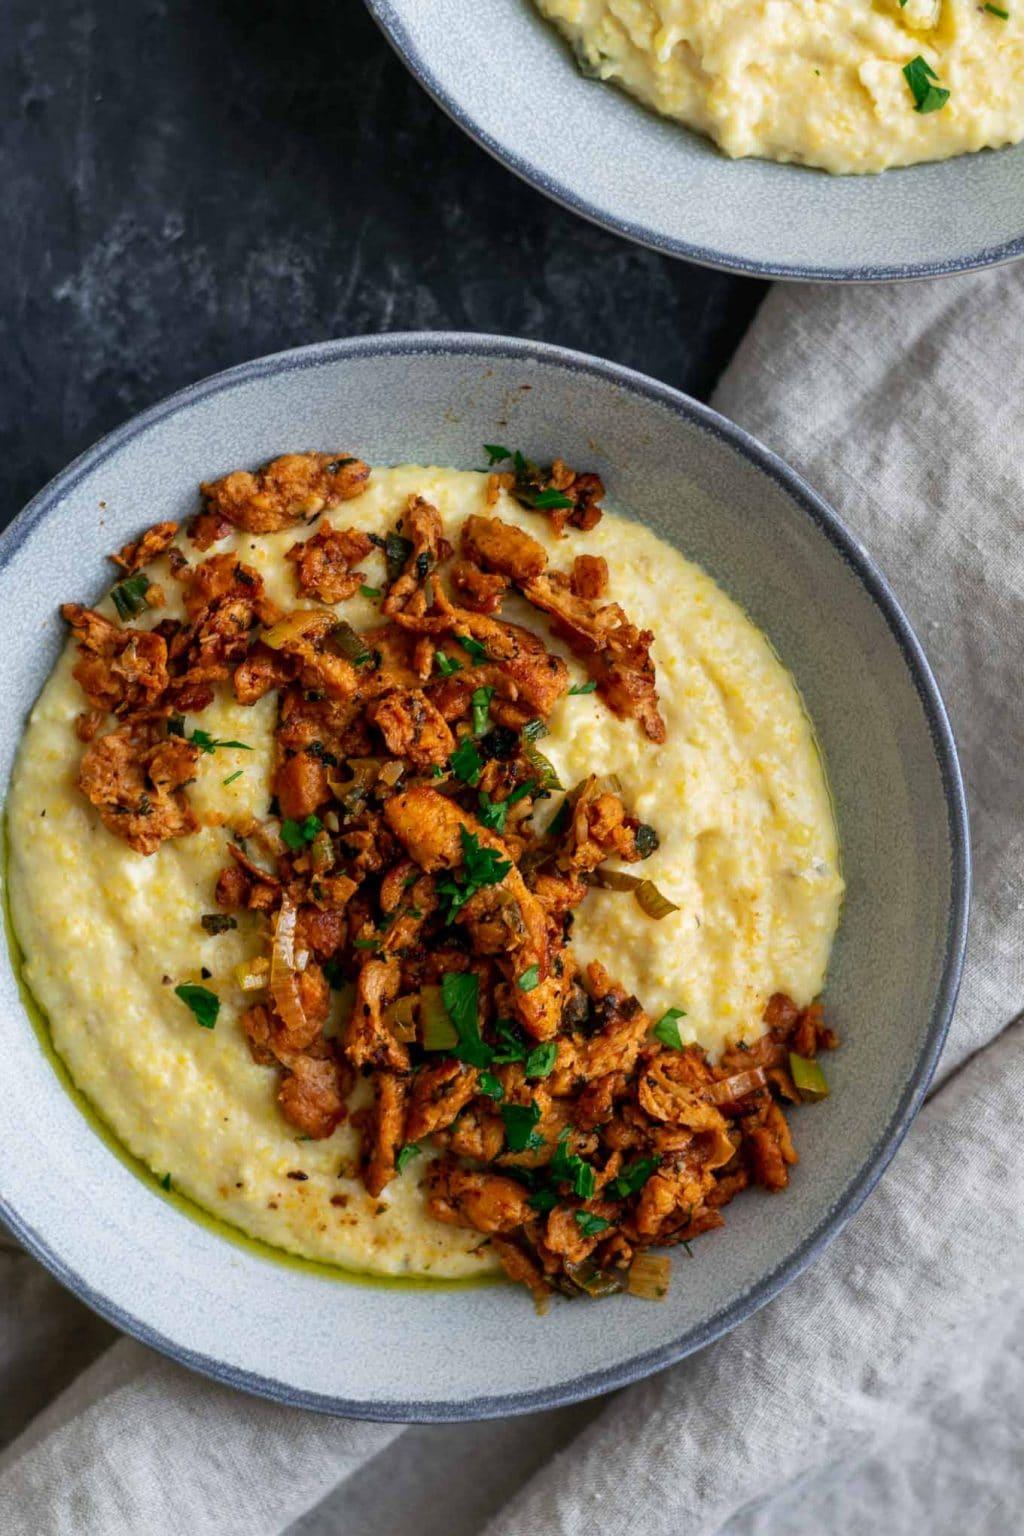 Cajun soy curls and creamy vegan jalapeño grits close up overhead of one bowl